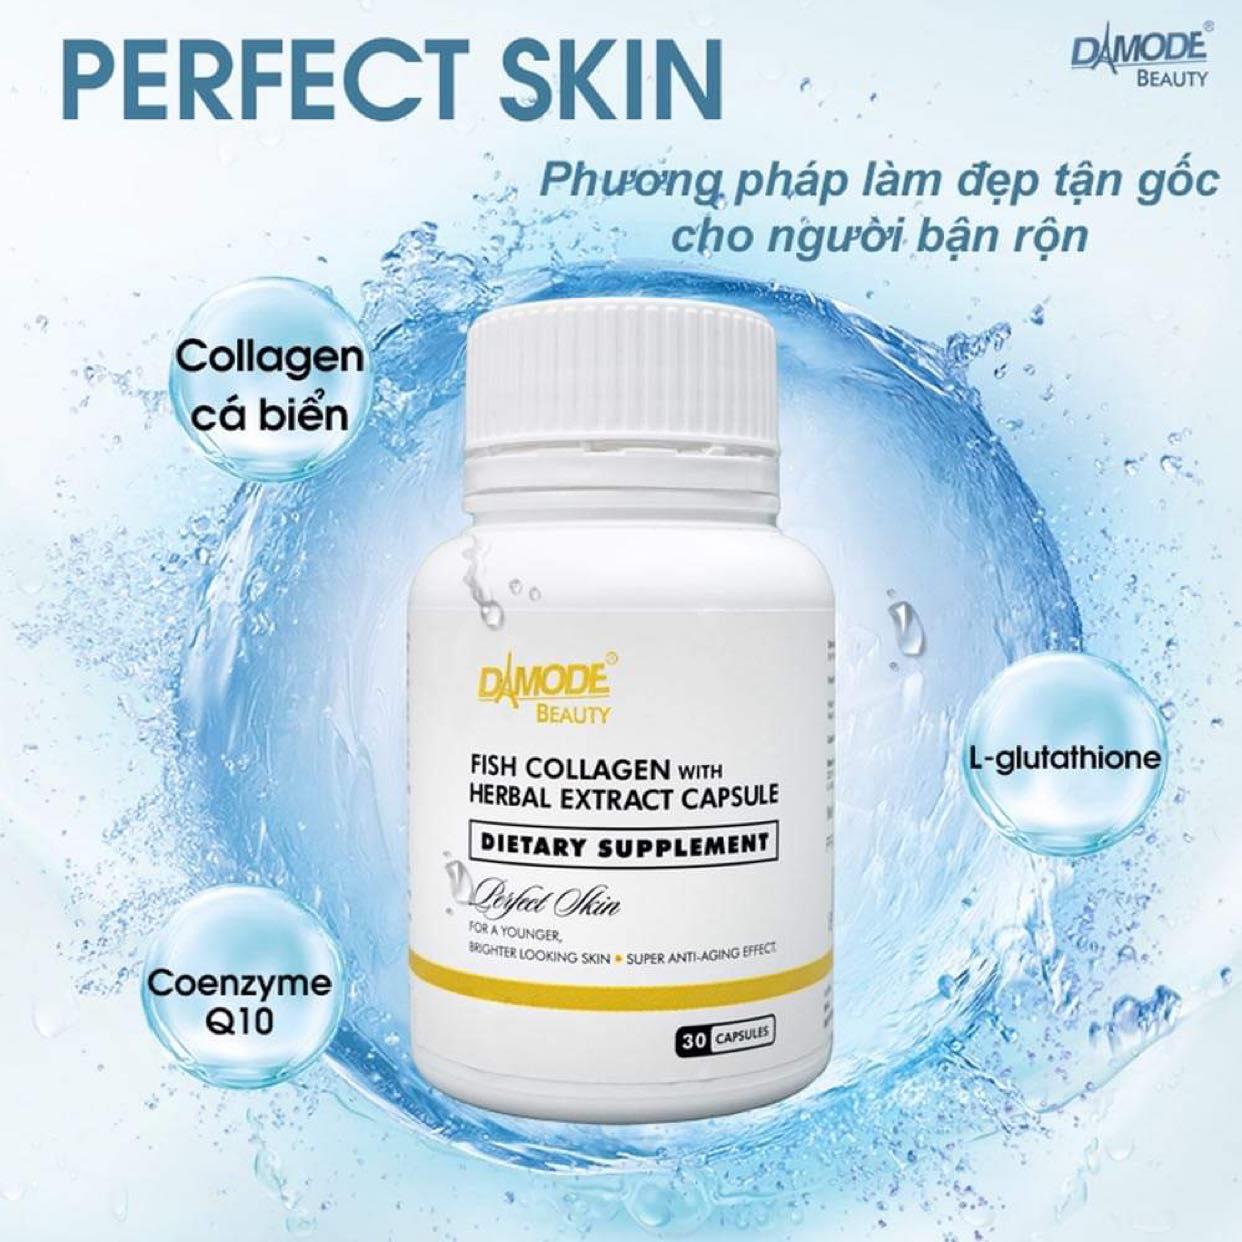 perfect-skin-fish-collagen-damode-2